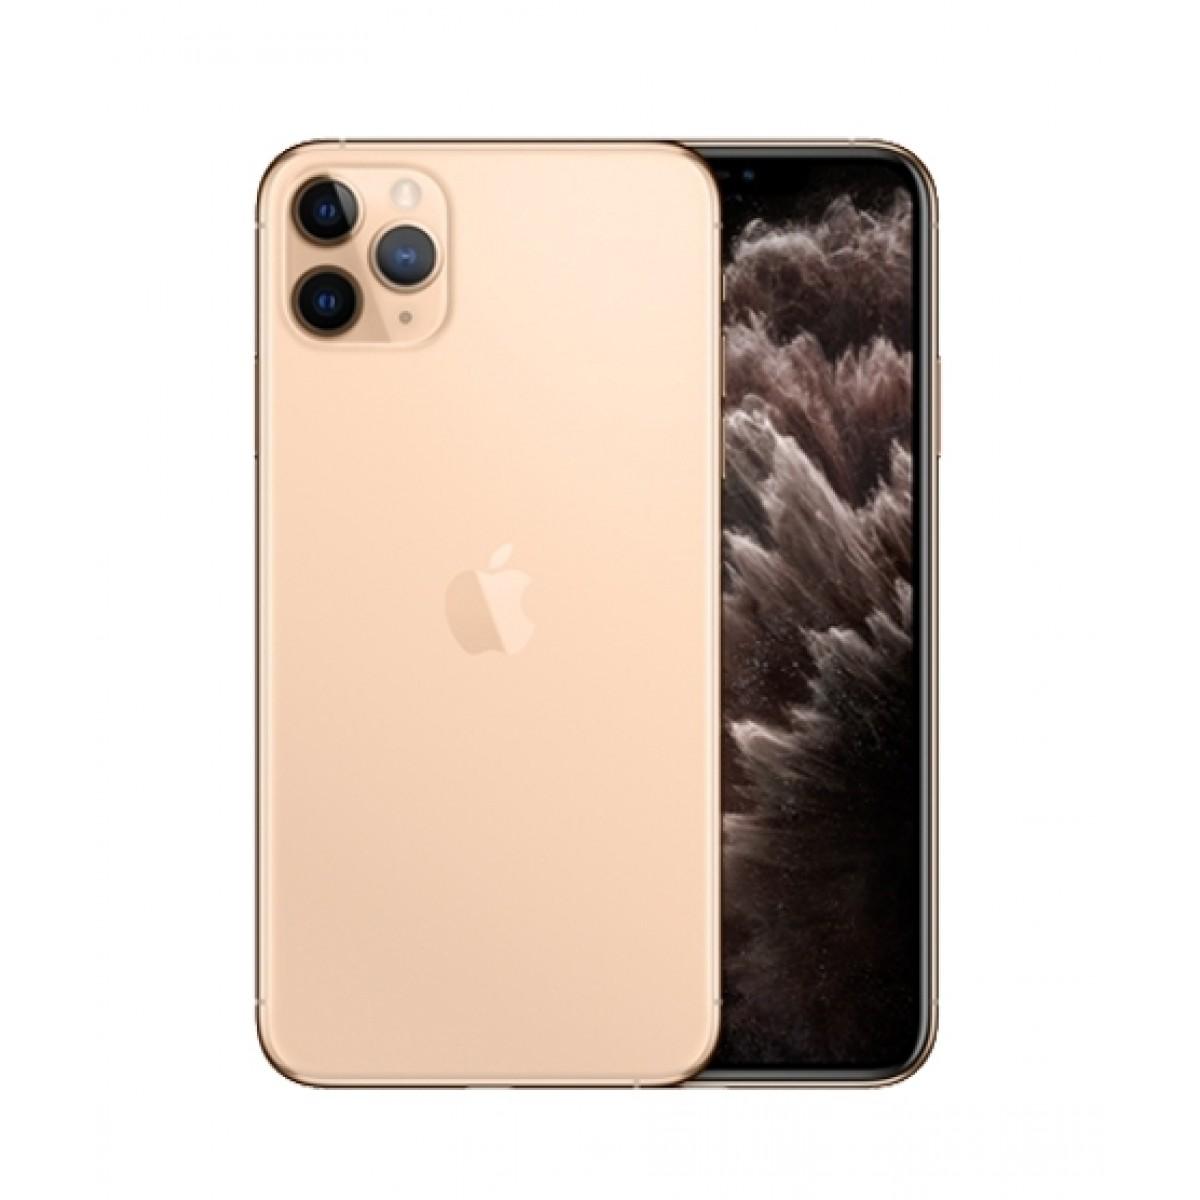 Apple Iphone 11 Pro Max Price In Pakistan Buy Apple Iphone 11 Pro Max 256gb Dual Sim Gold Ishopping Pk